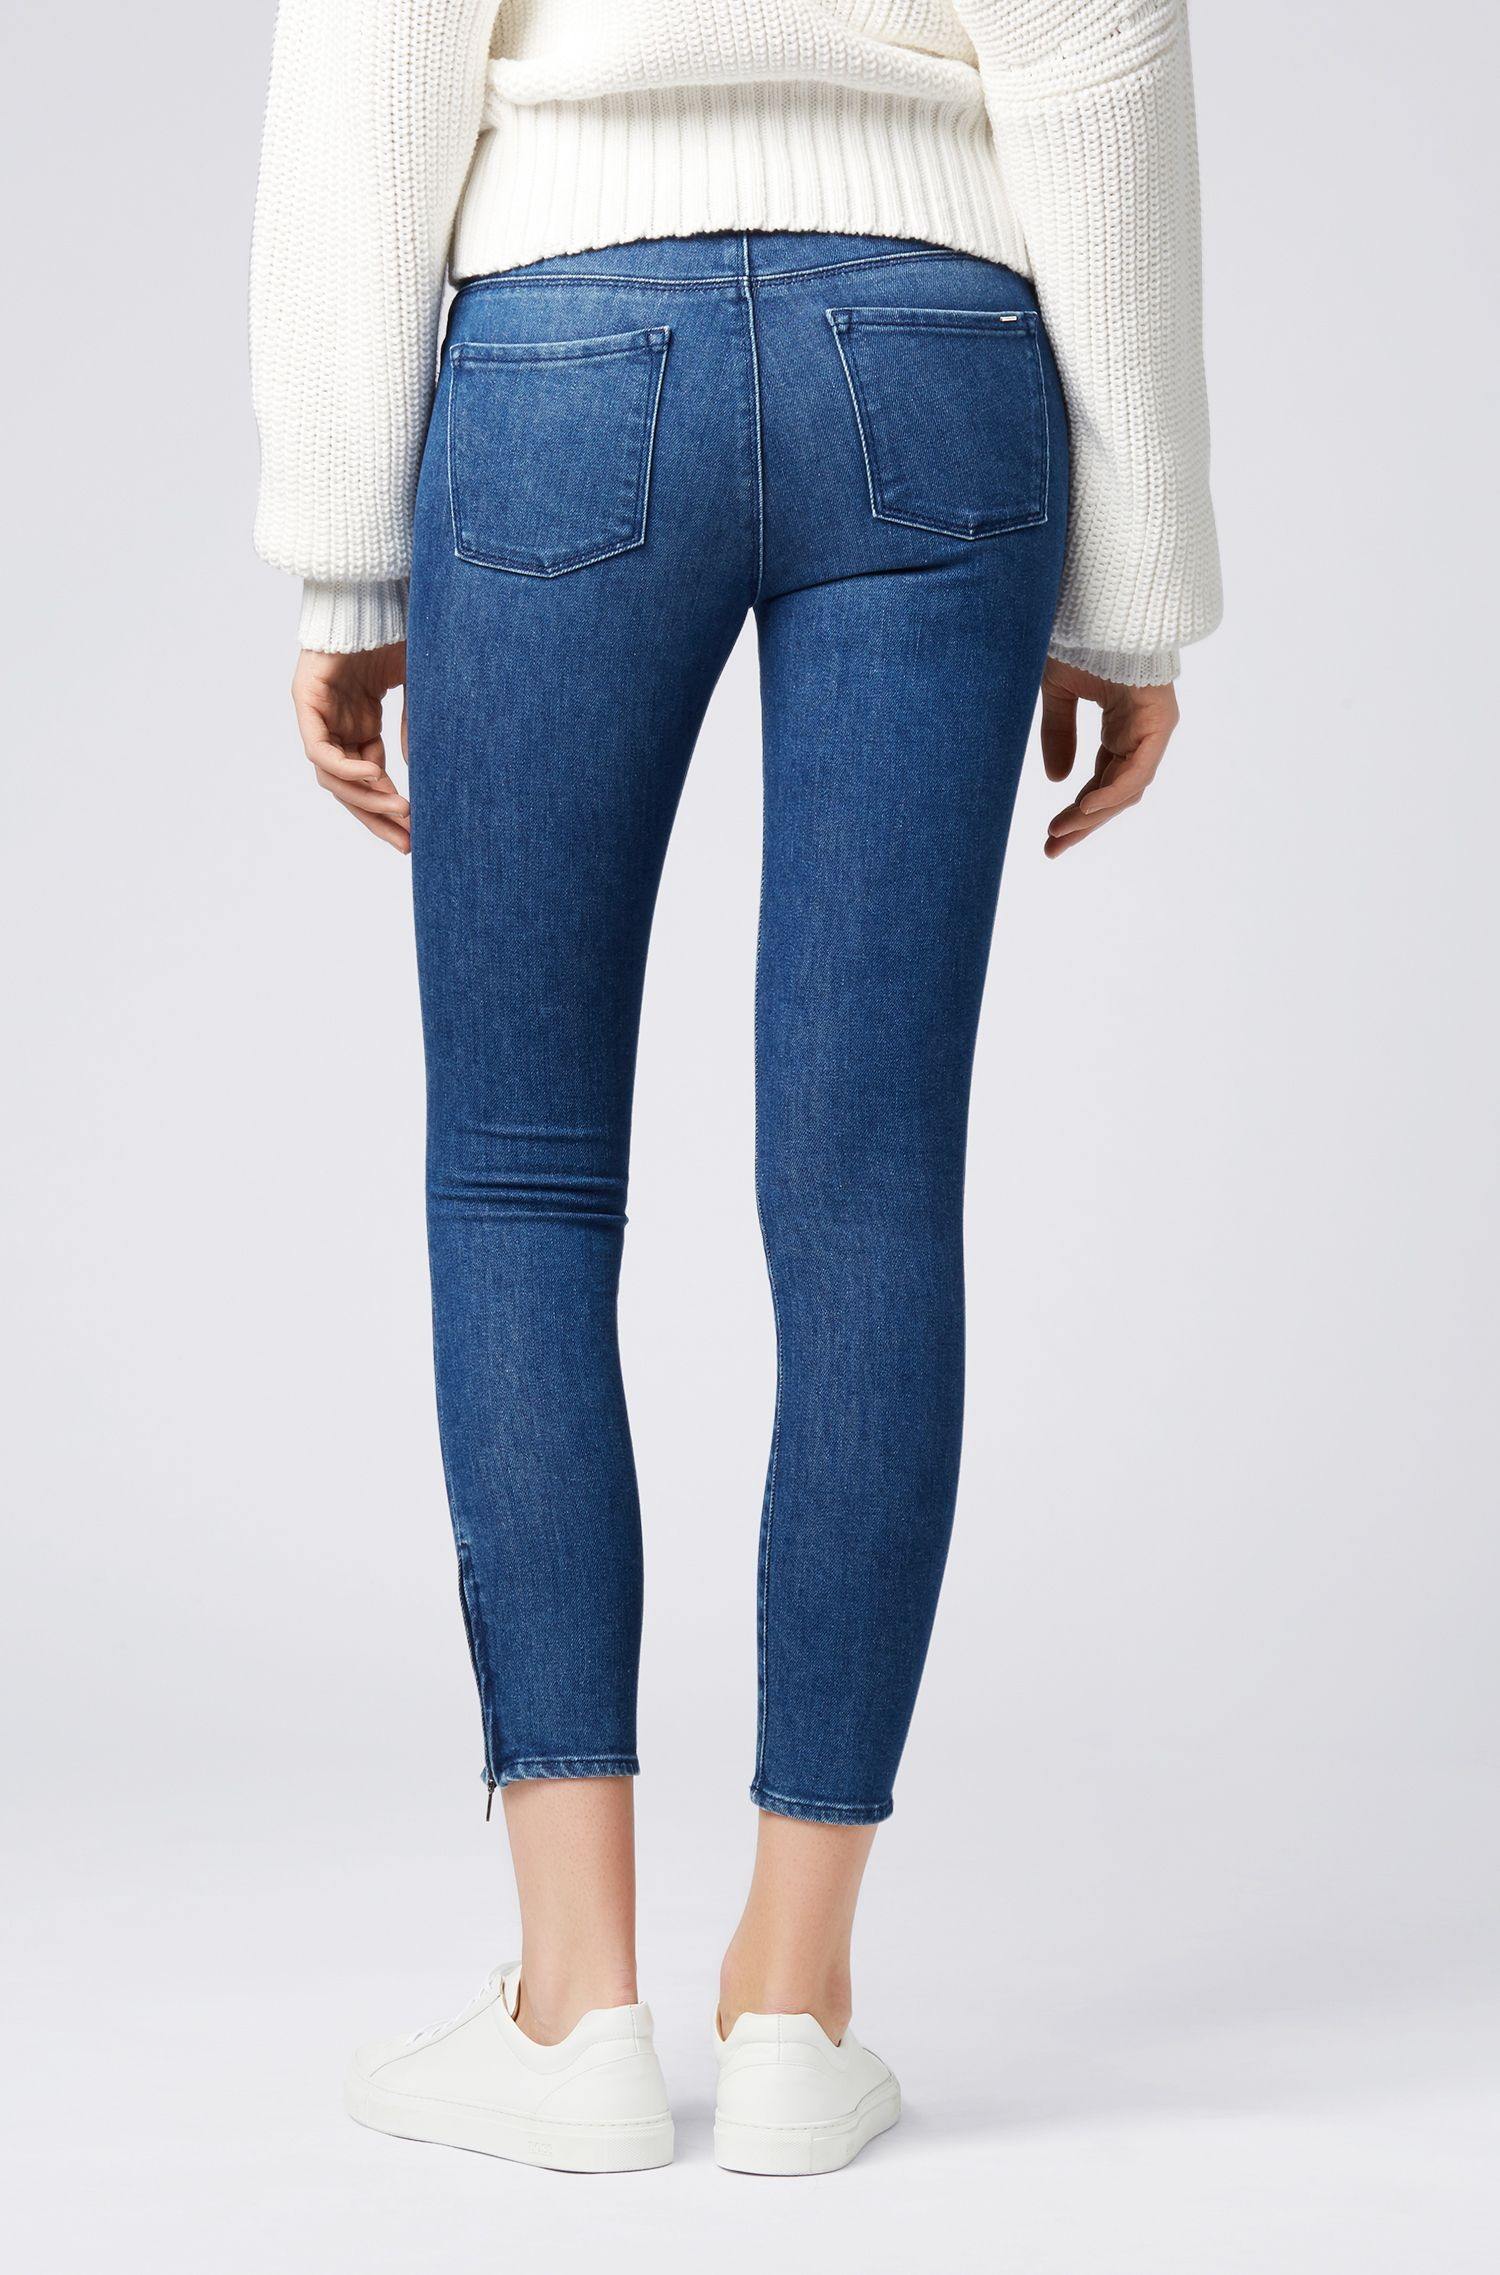 Hugo Boss - Skinny-Fit Jeans aus komfortablem Stretch-Denim - 4